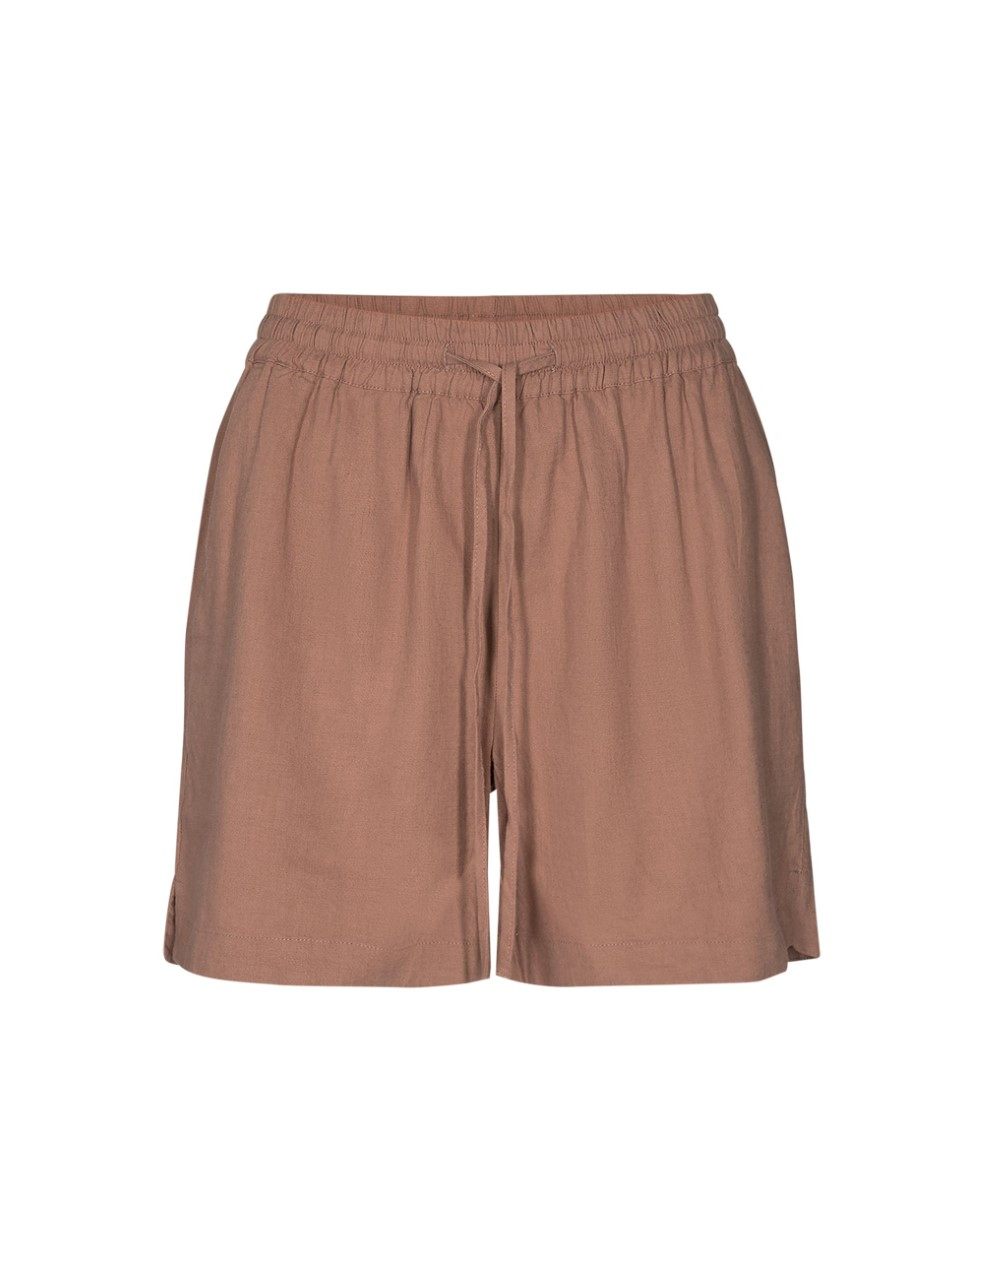 Leveteroom Naja2 Shorts